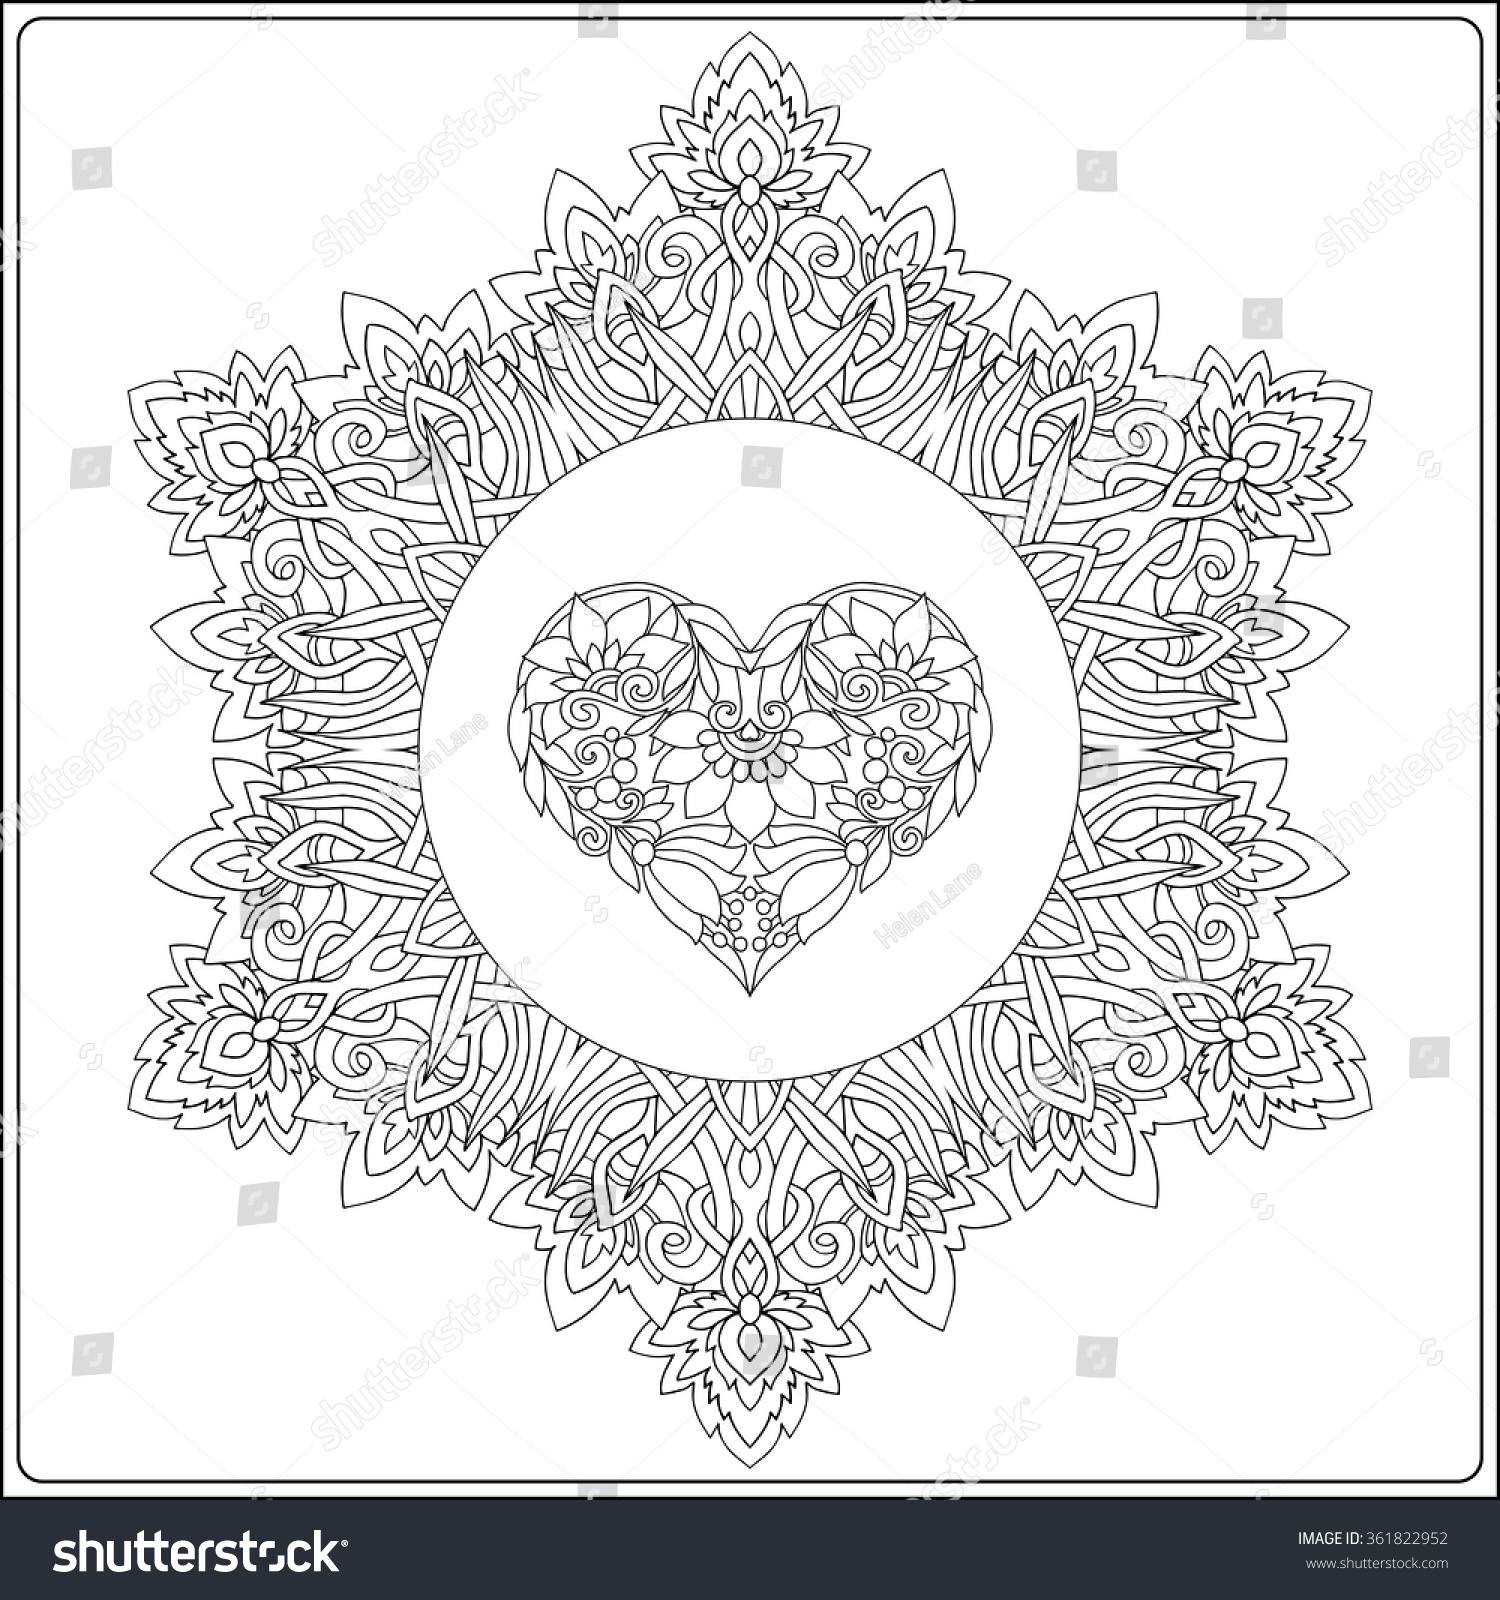 Hand Drawn Floral Mandala Butterflies Decorative Stock Vector ...